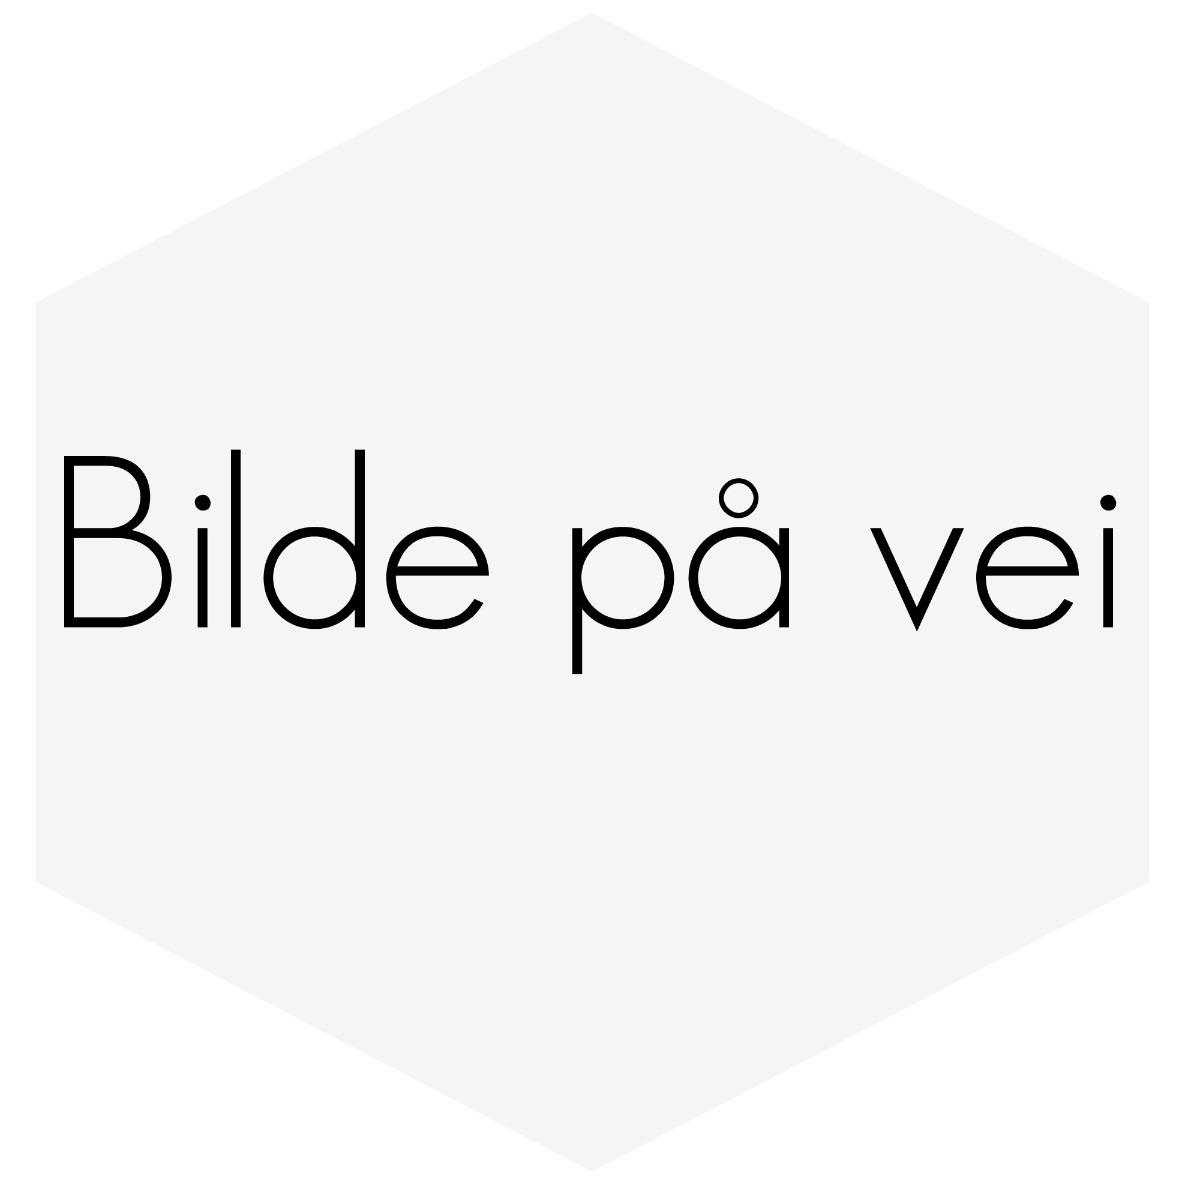 EXTRAKTORGRENRØR 740 STEG 2-3(DOBBLE FORGASSERE M.M)